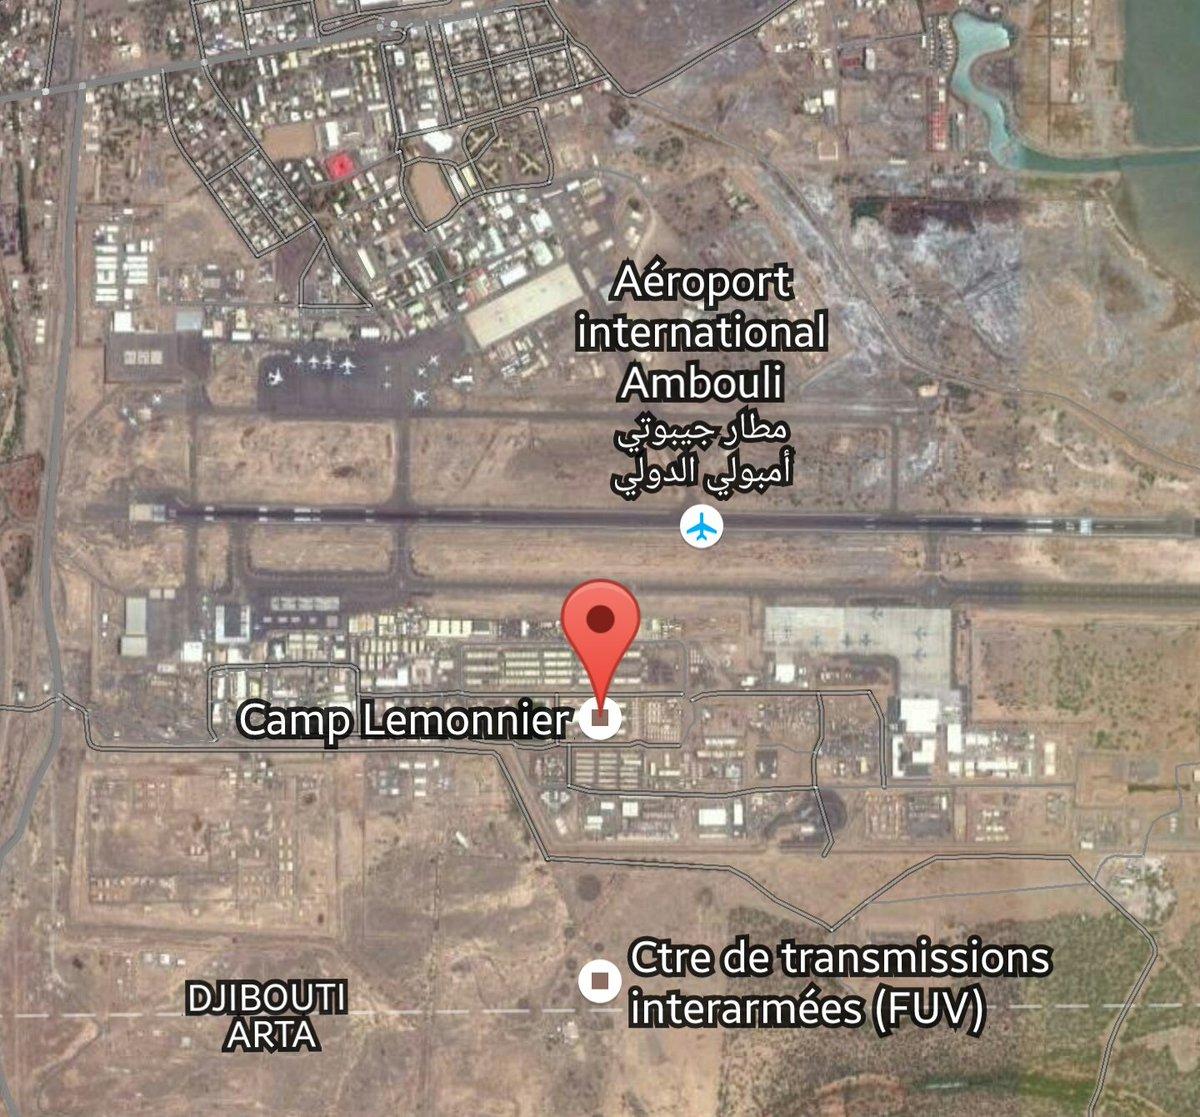 EKTAKTO: Ιράν-ΗΠΑ σε τροχιά σύρραξης – Μεταστάθμευσαν Αμερικανικά F-16CM για βομβαρδισμούς- Aναπτύχθηκε Ιρανικός στόλος απέναντι από τον αμερικανικό στην Υεμένη (εικόνες) - Εικόνα1